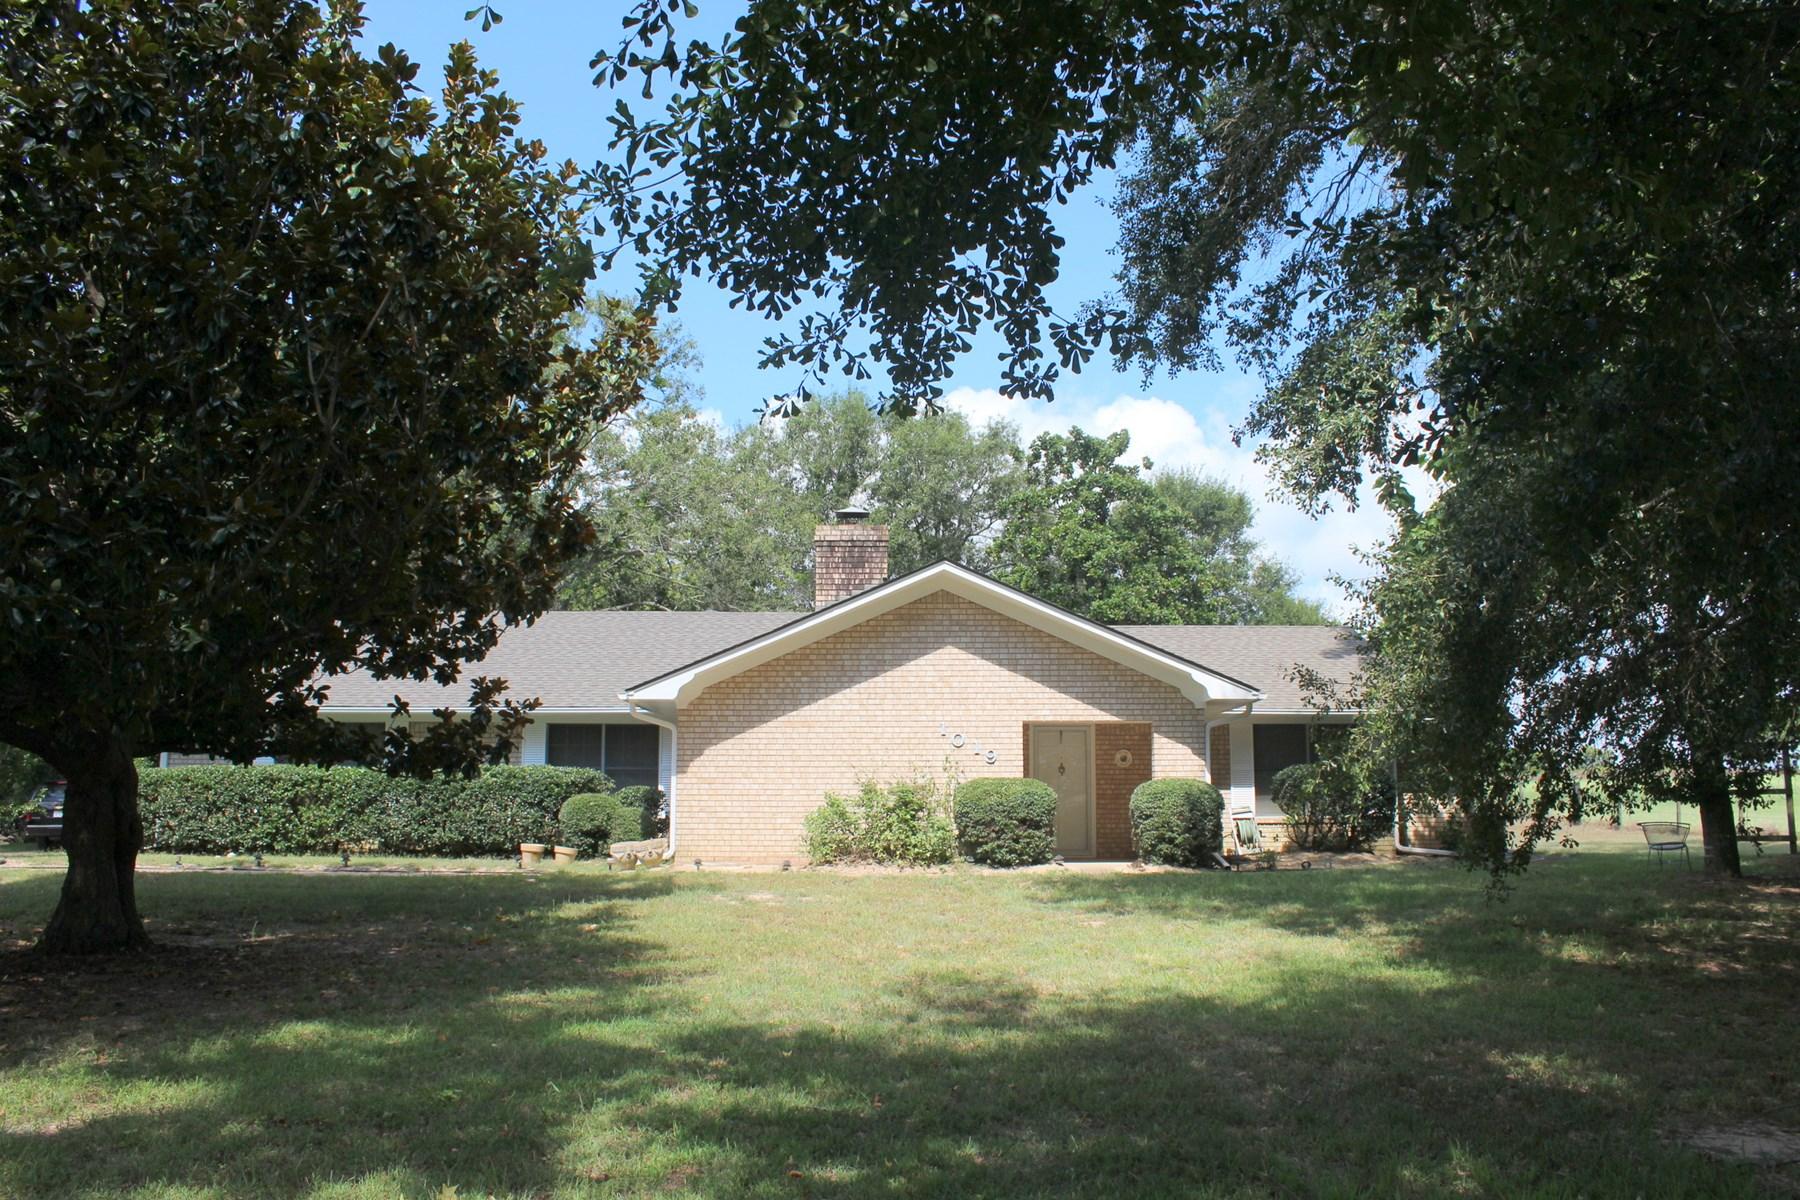 3BR-2BA-2CG BRICK HOME WINNSBORO, TEXAS FRANKLIN COUNTY TX